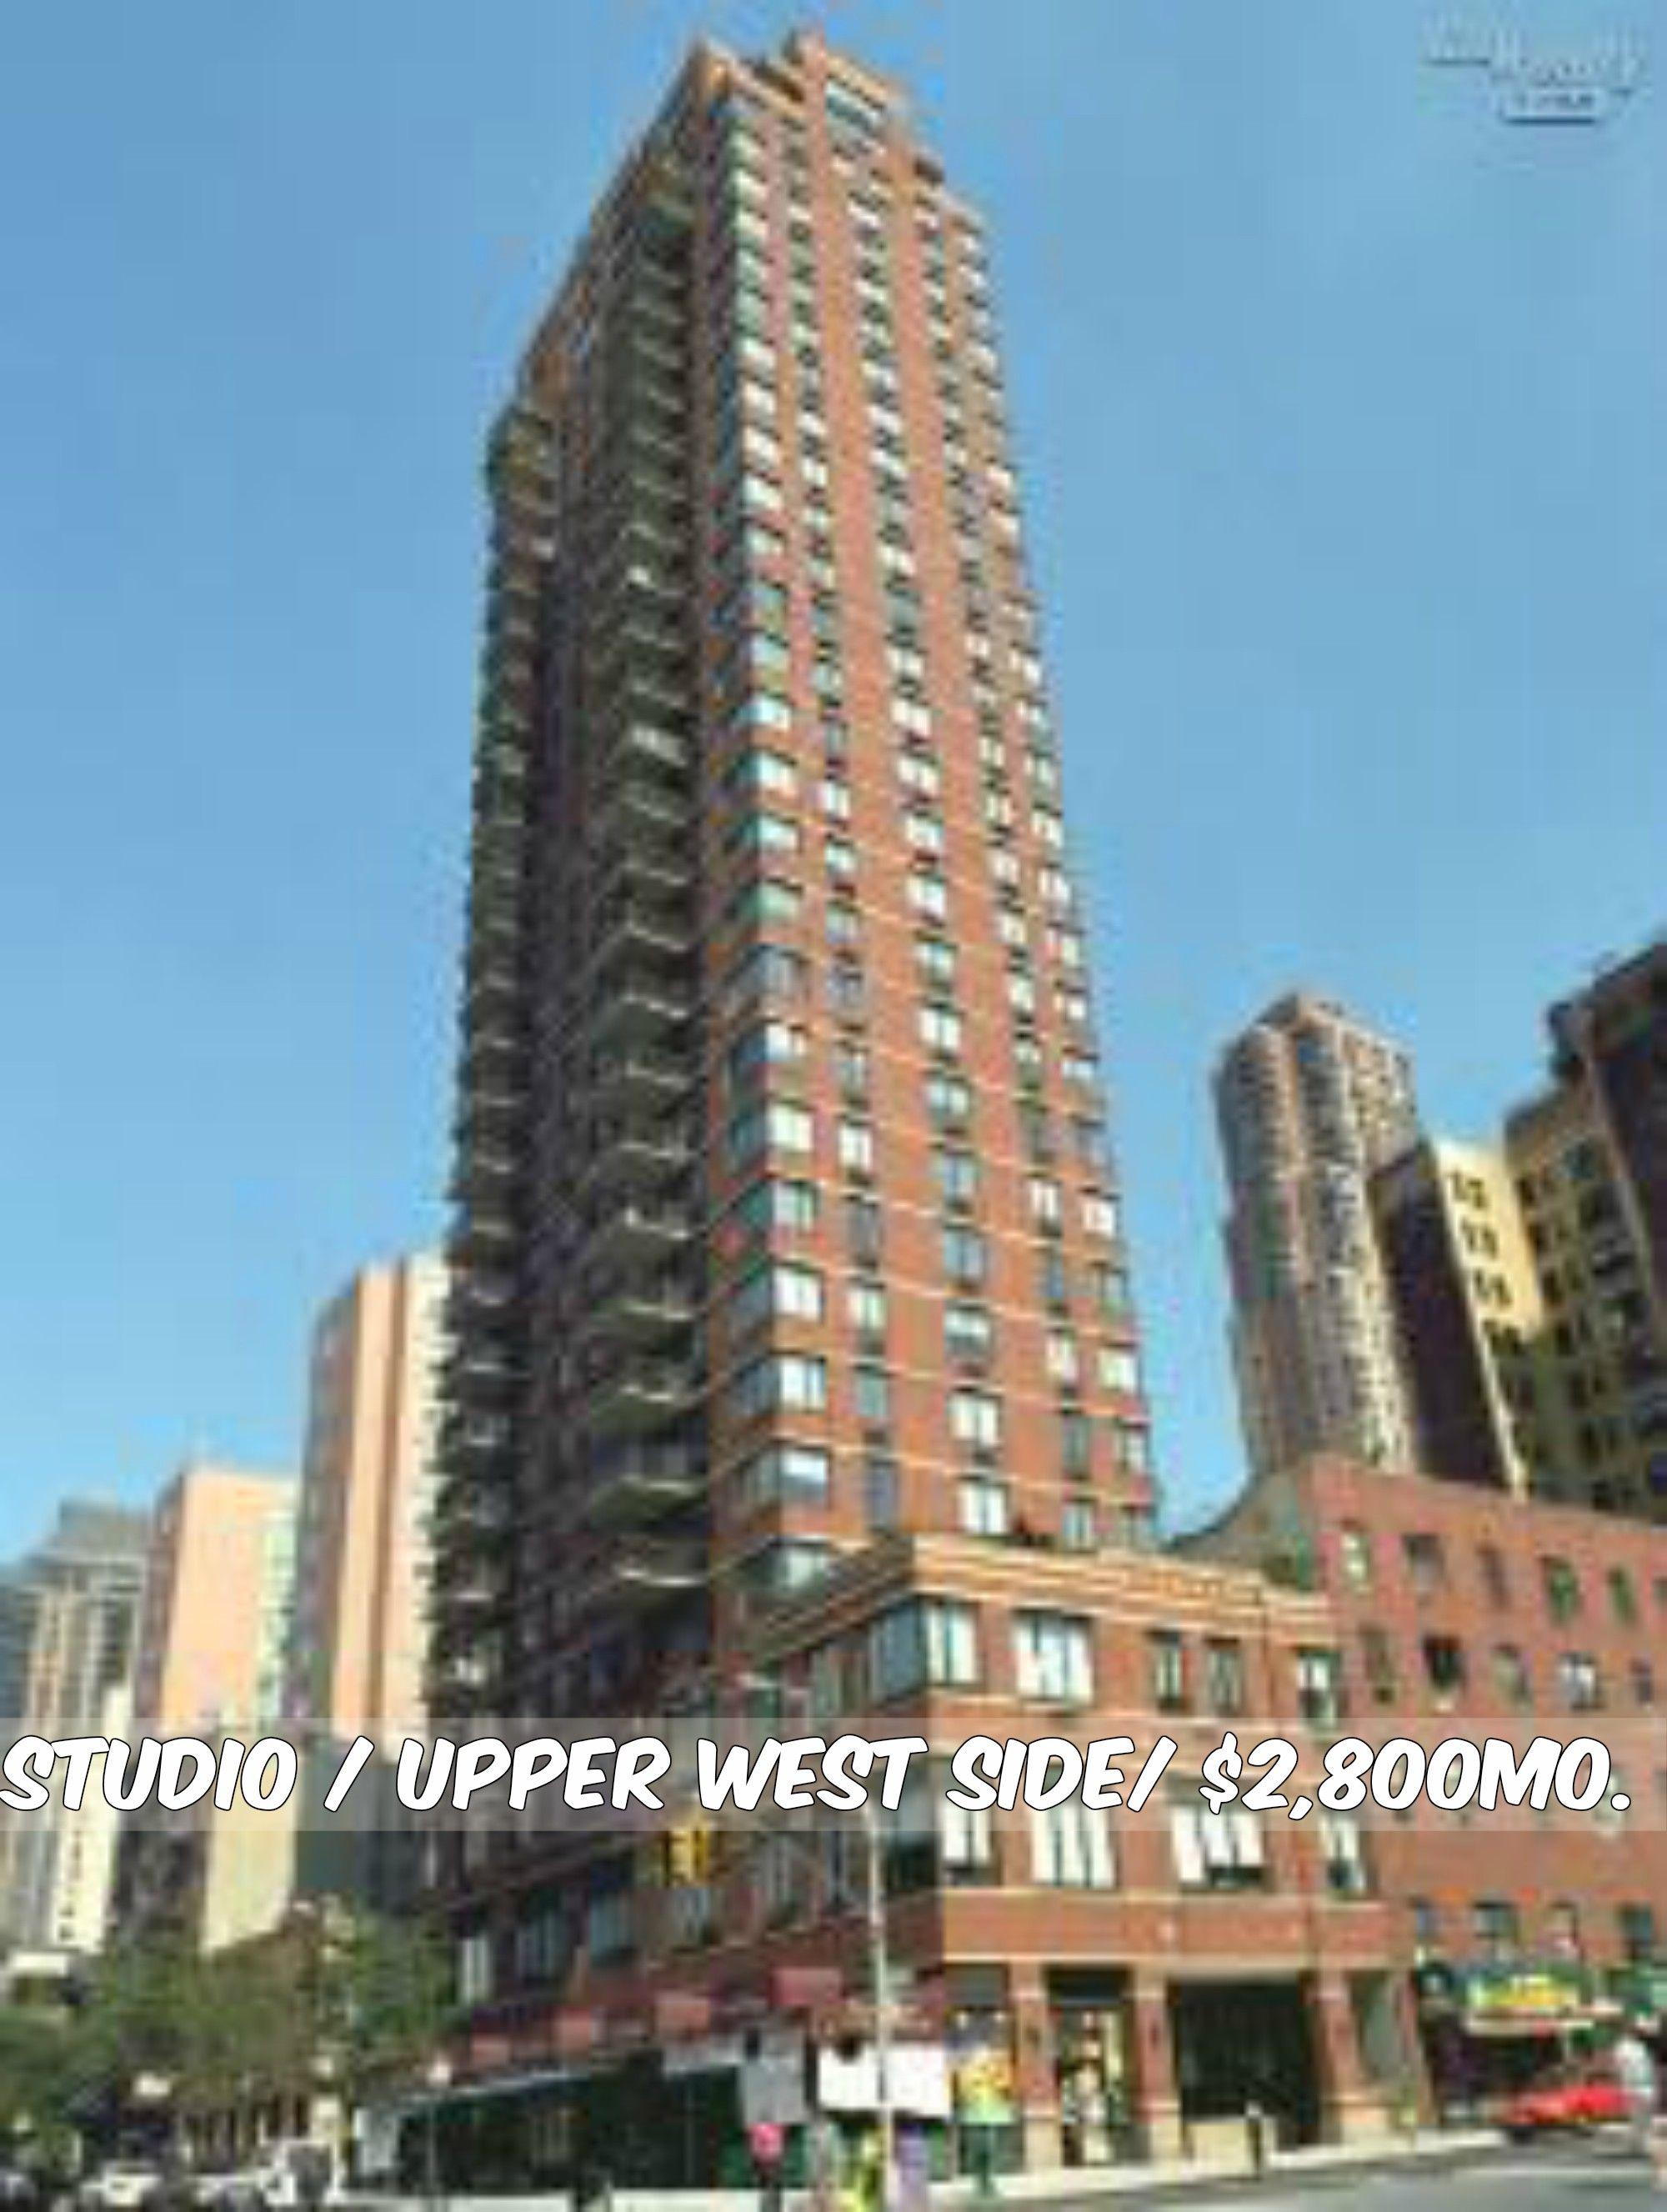 Studio Apt For Rent In West Side At 2 800 Mo Doorman Elevator